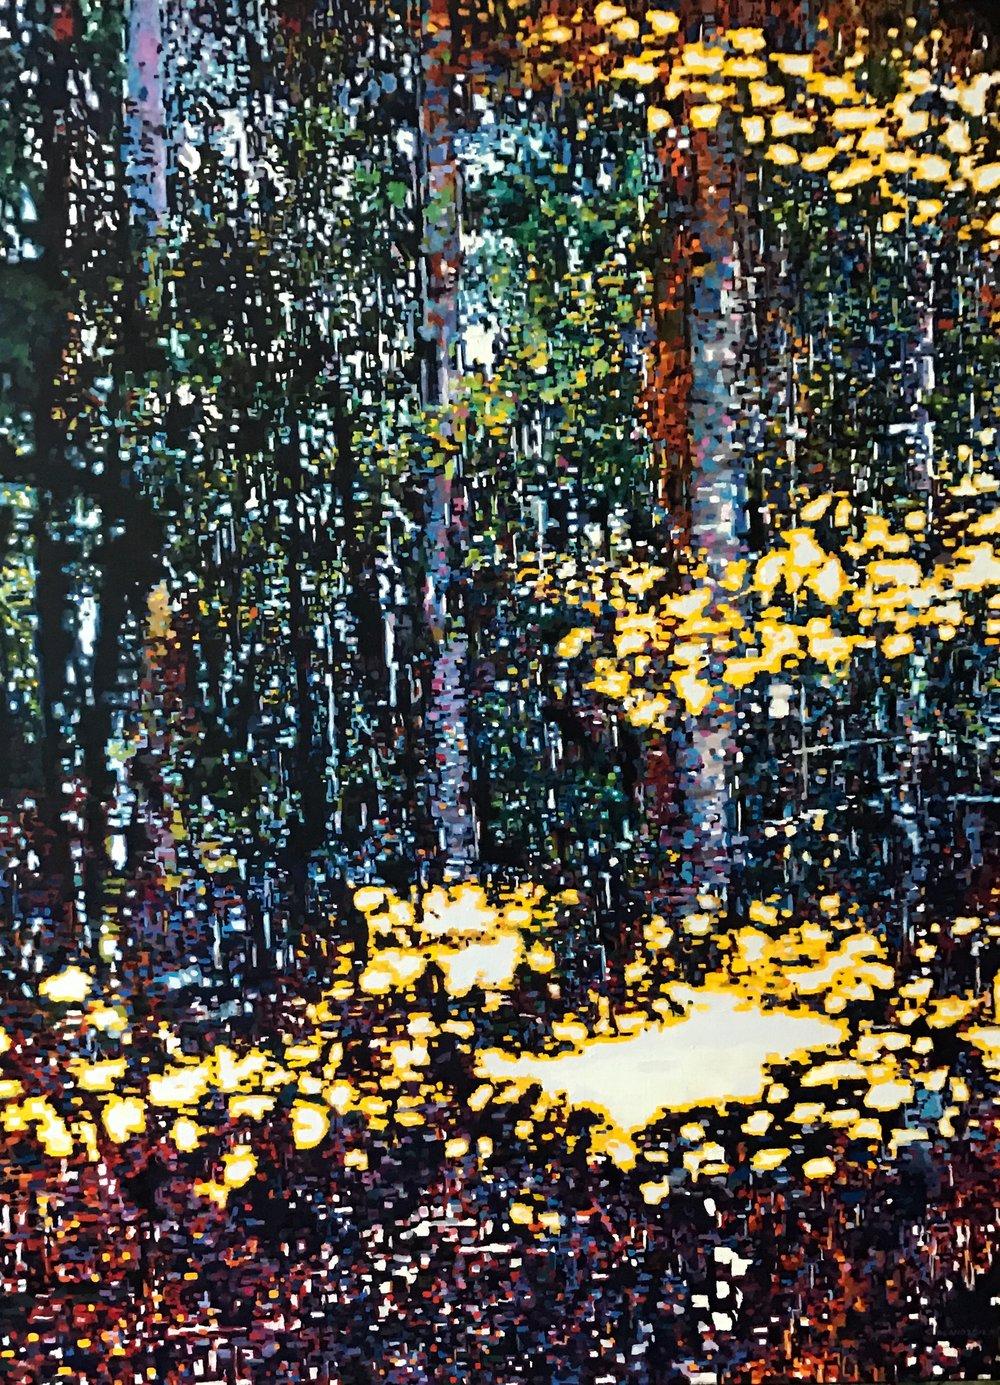 "Digital Forest, Oil on Linen, 30"" x 40"", 2016"